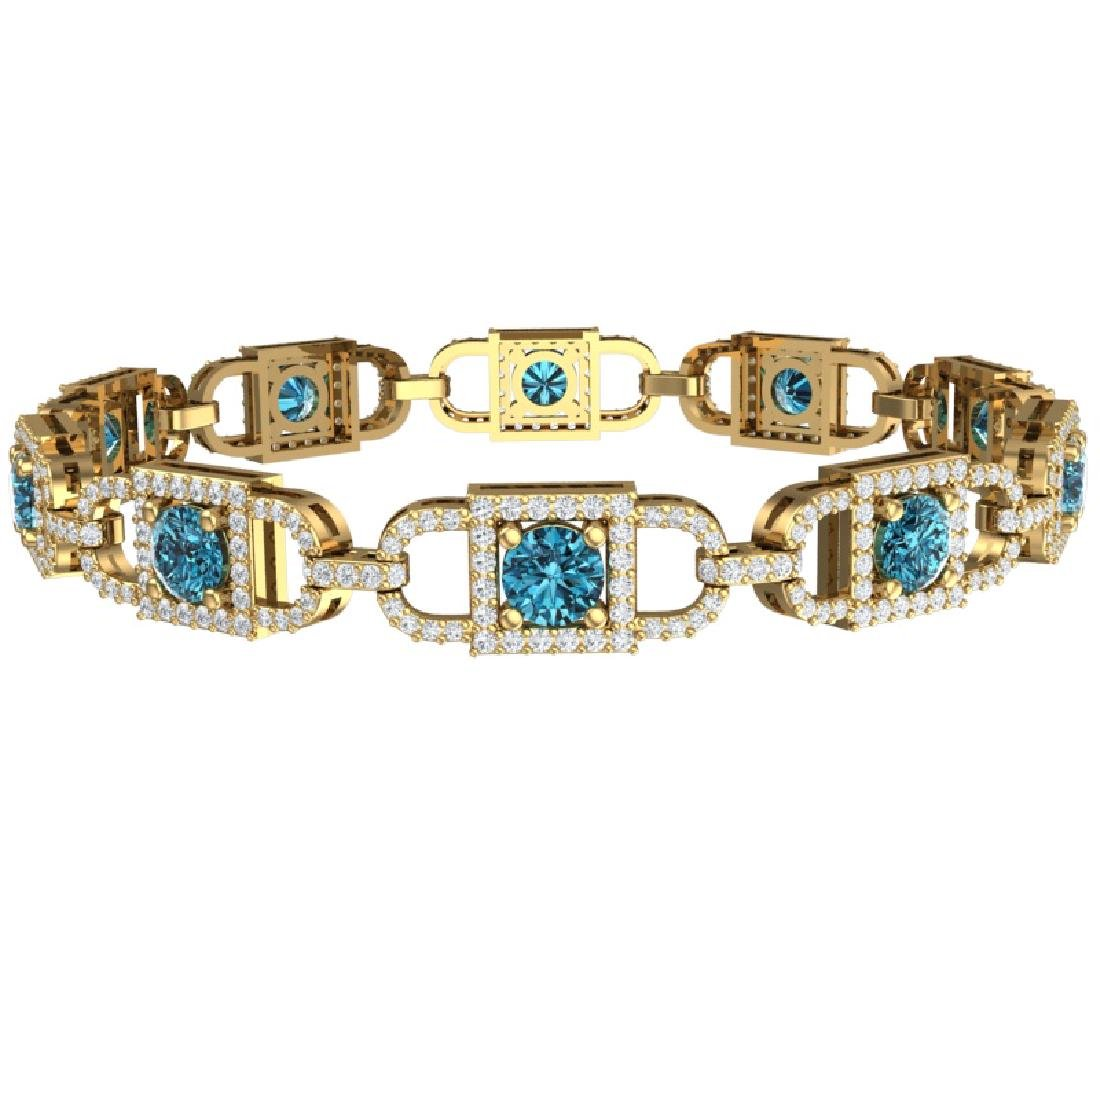 8 CTW SI/I Intense Blue And White Diamond Bracelet 18K - 2